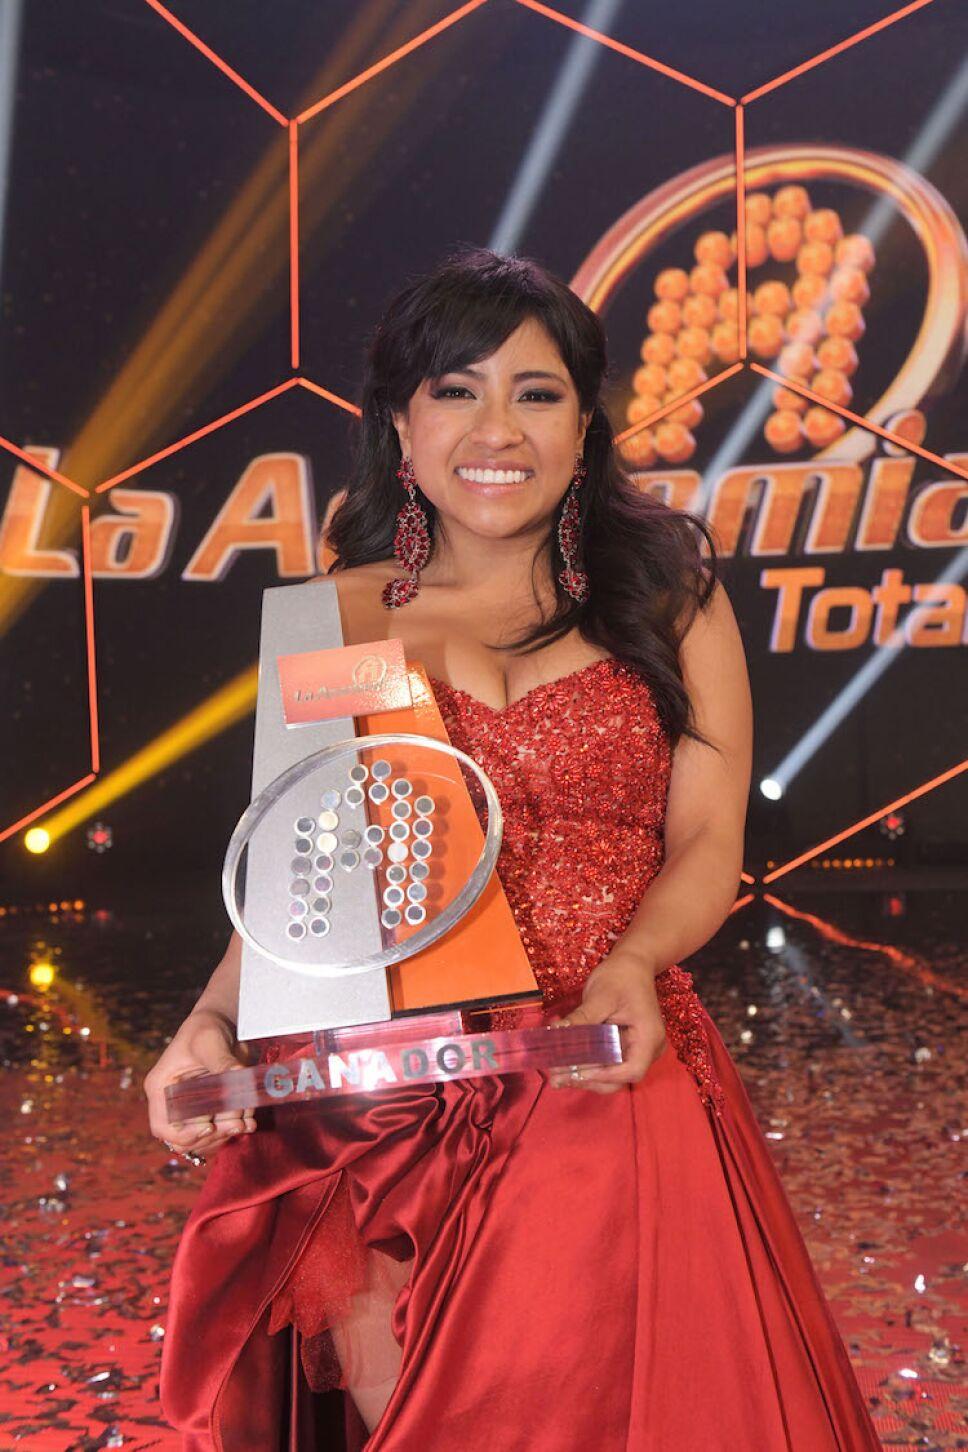 Paola gana La Academia 2018